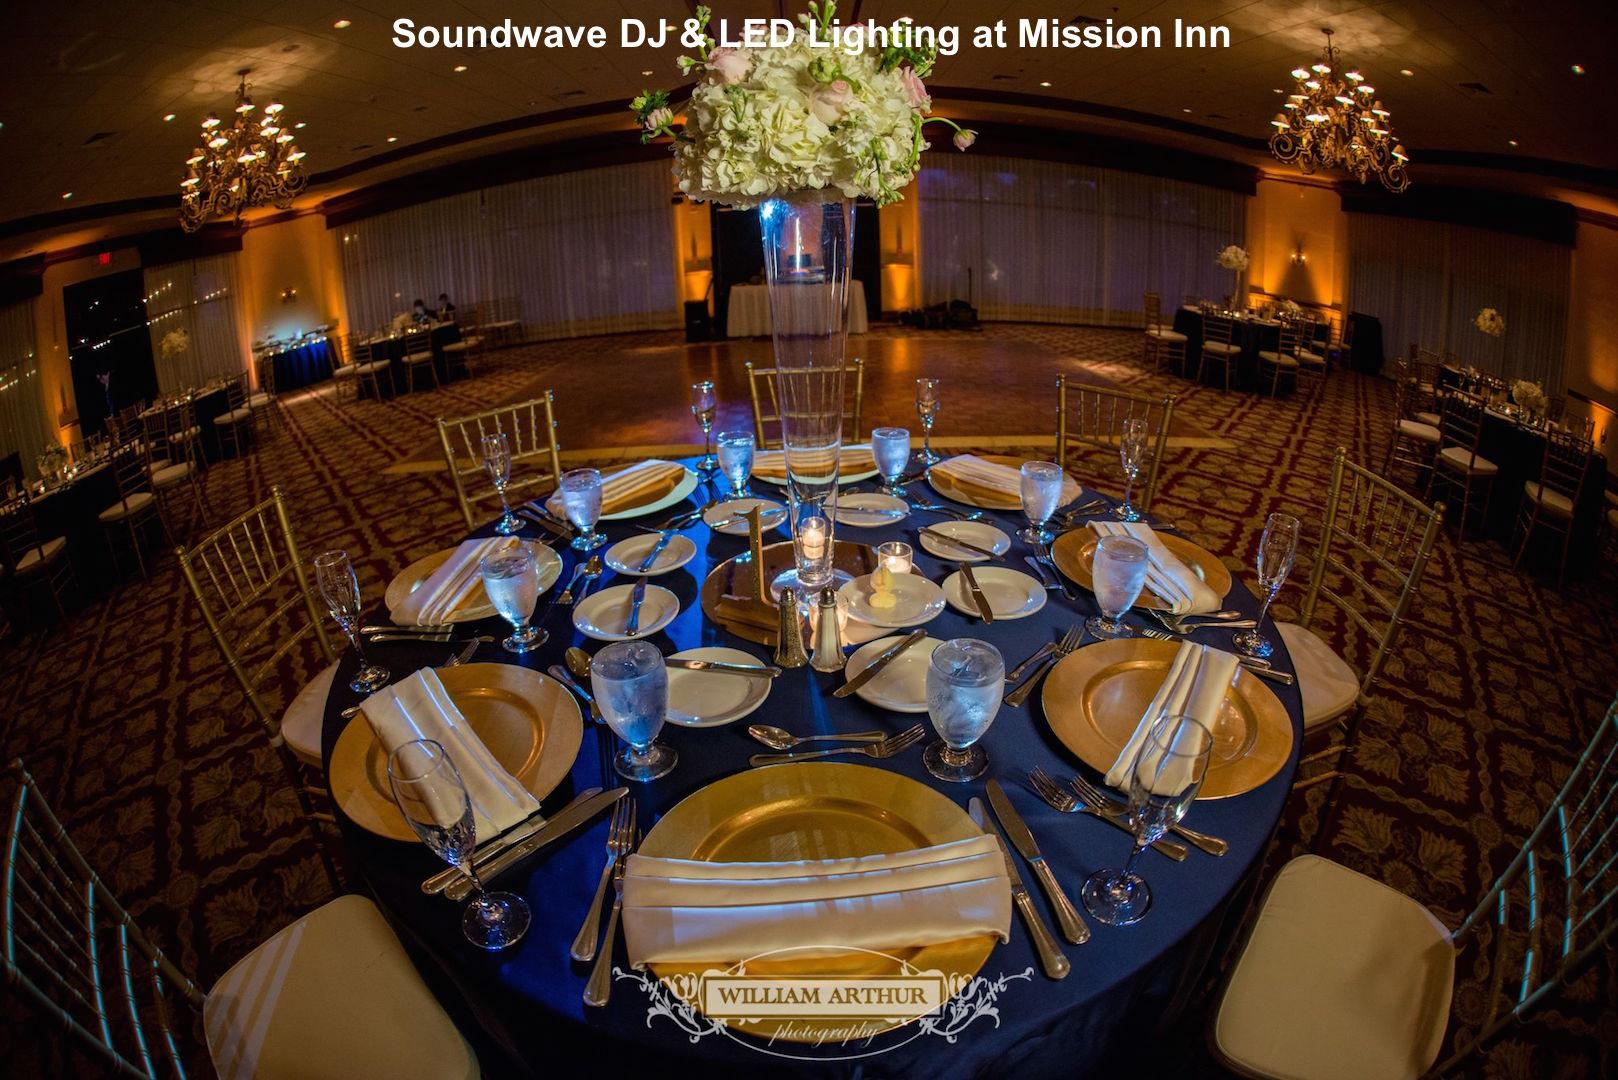 soundwave entertainment - orlando wedding dj - orlando LED Lighting - orlando wedding venue - mission inn